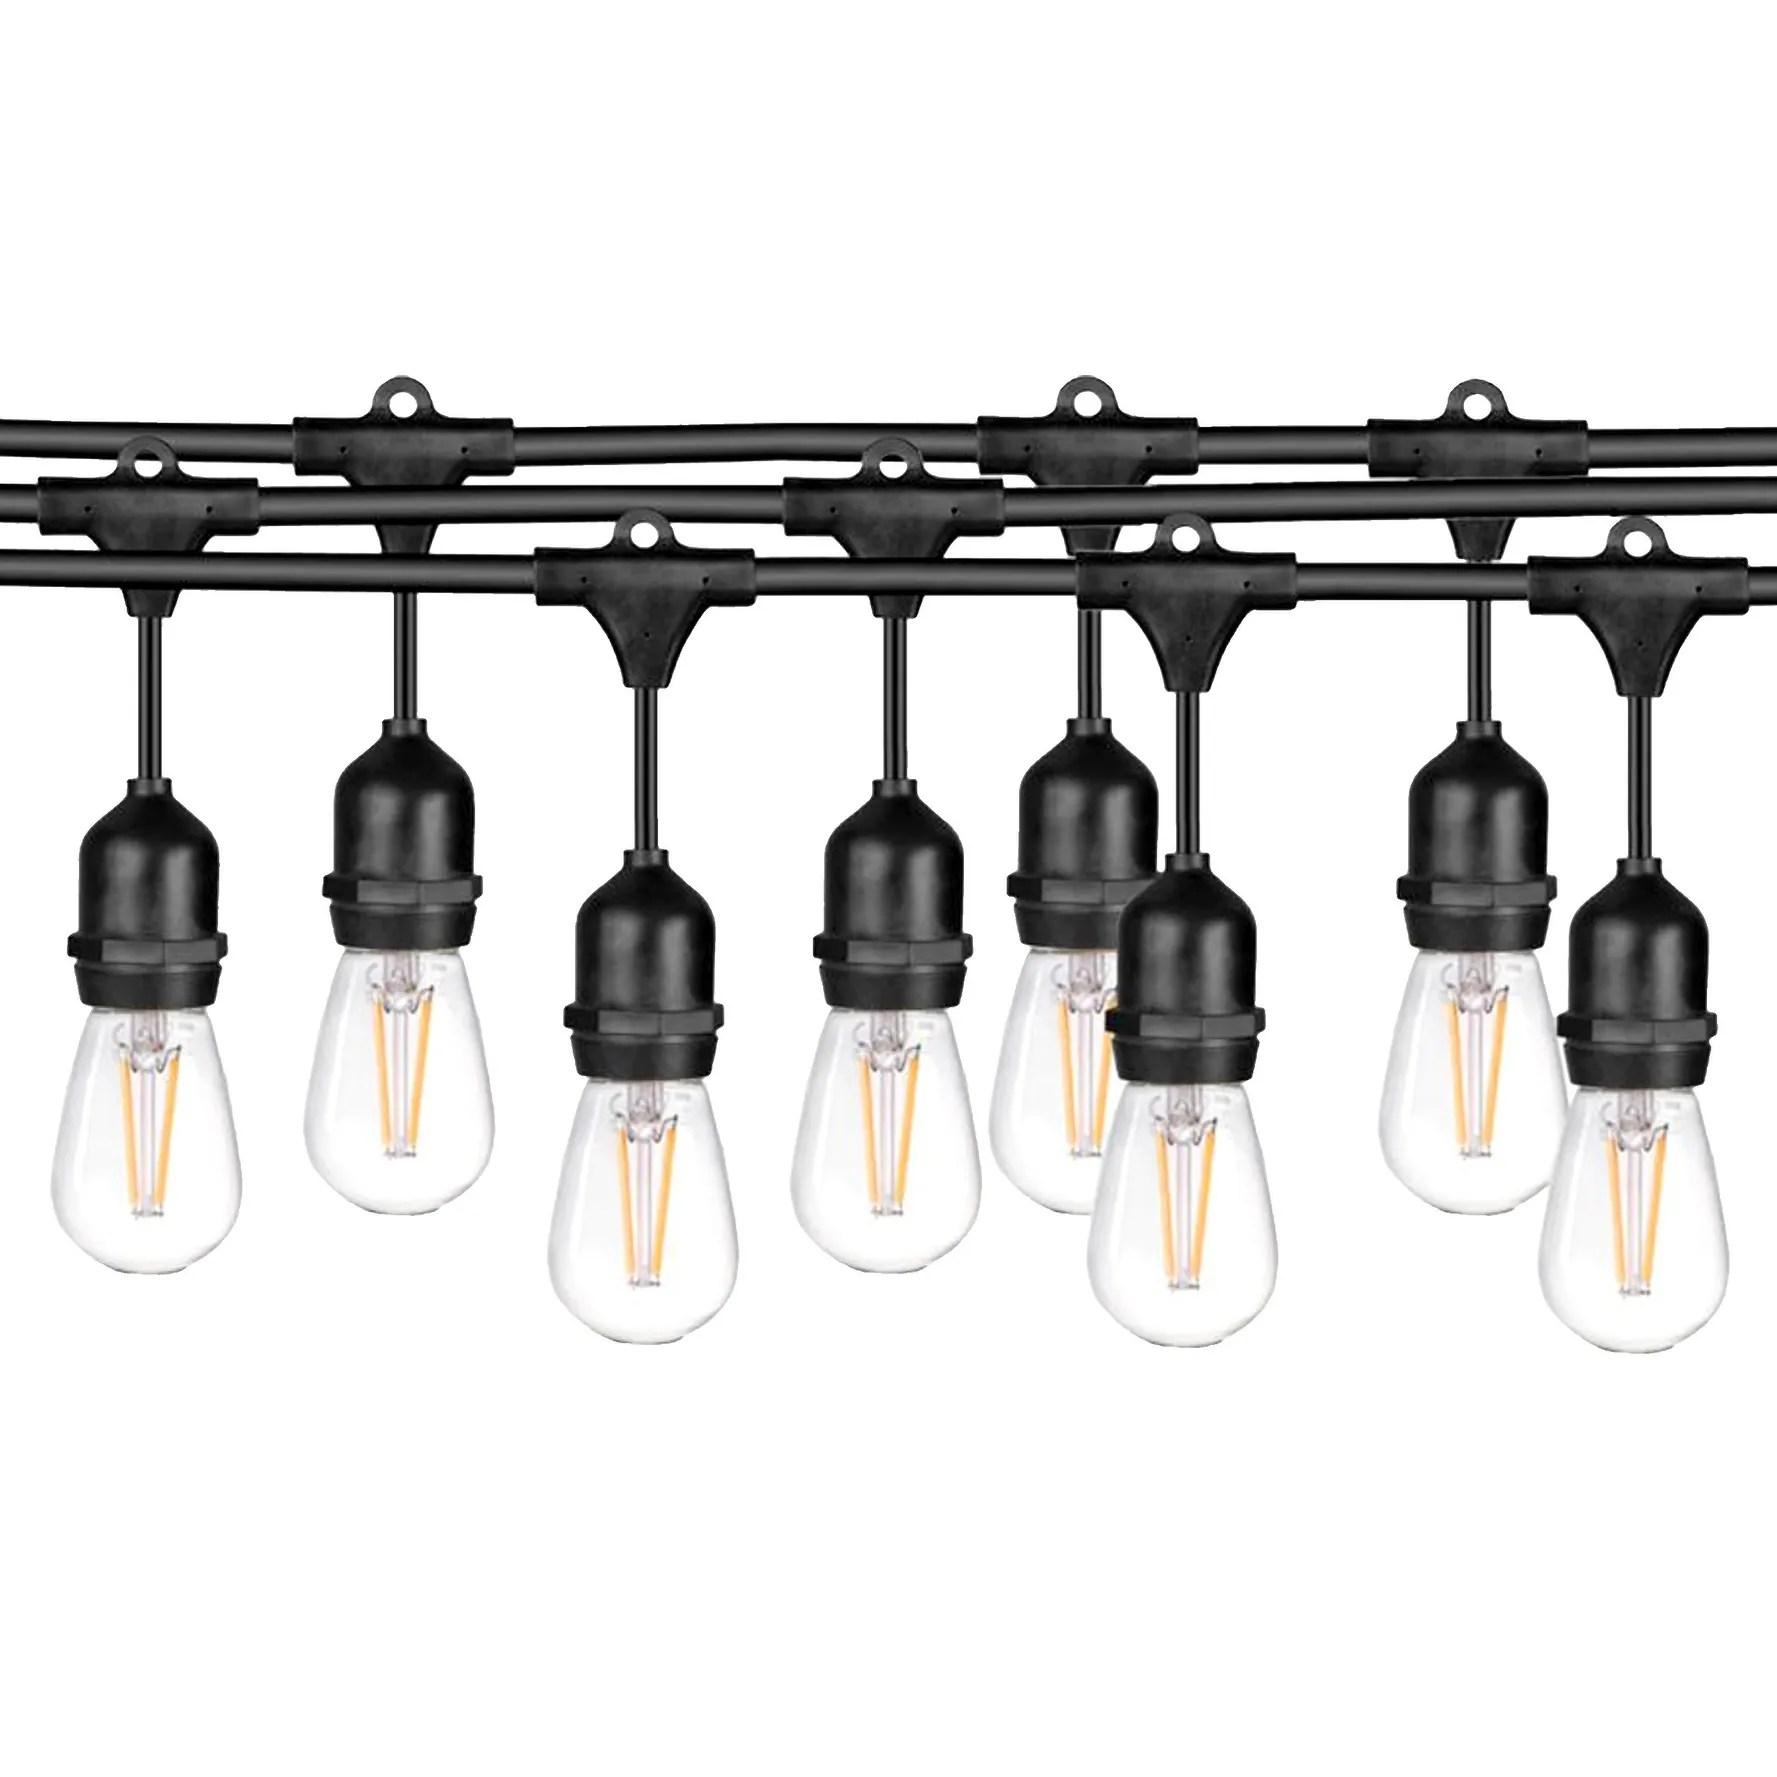 ledpax 48 foot outdoor waterproof 15 light led string lights black 48 foot